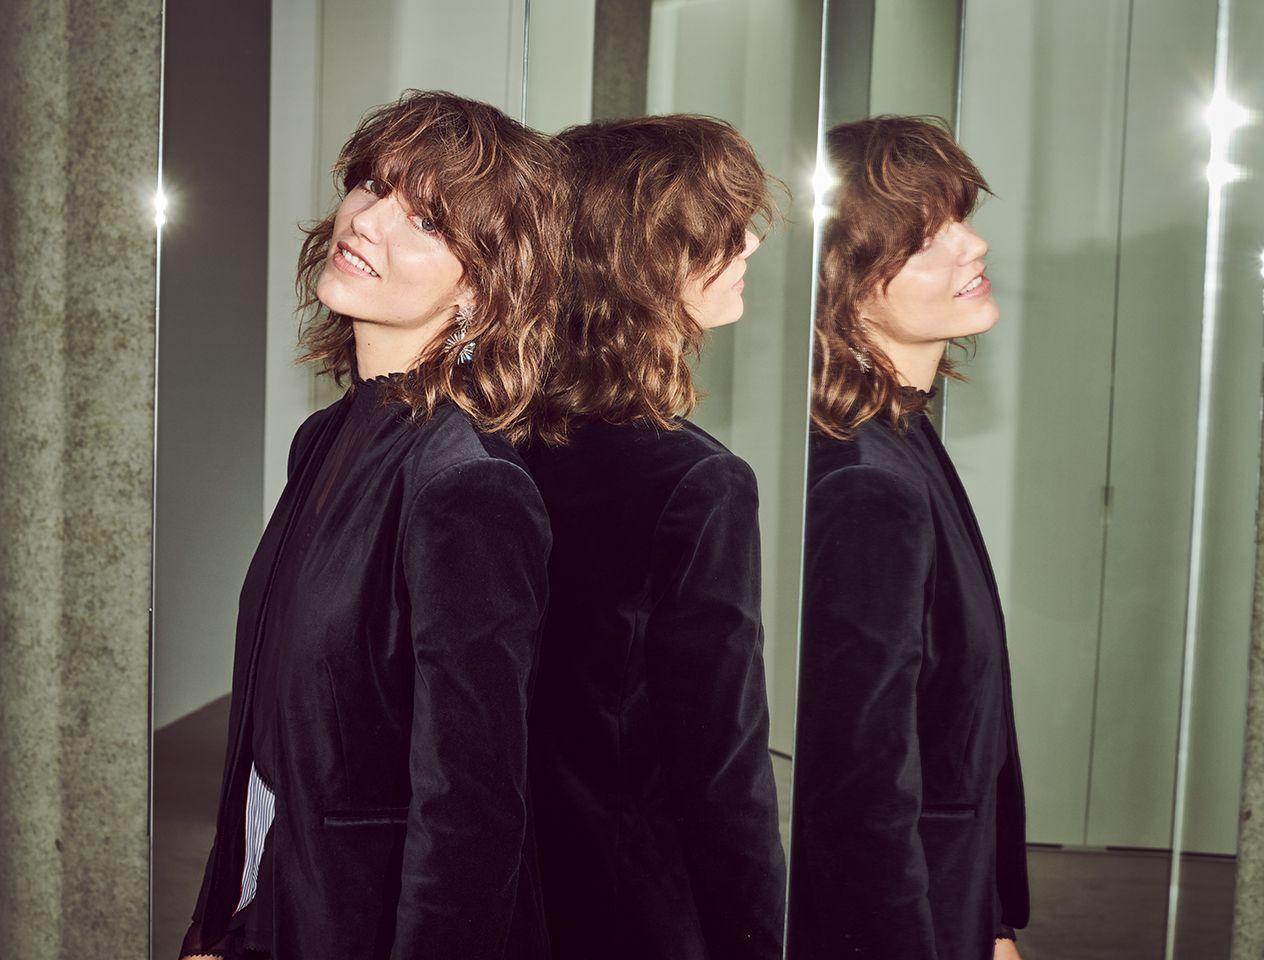 Model wearing a velvet jacket